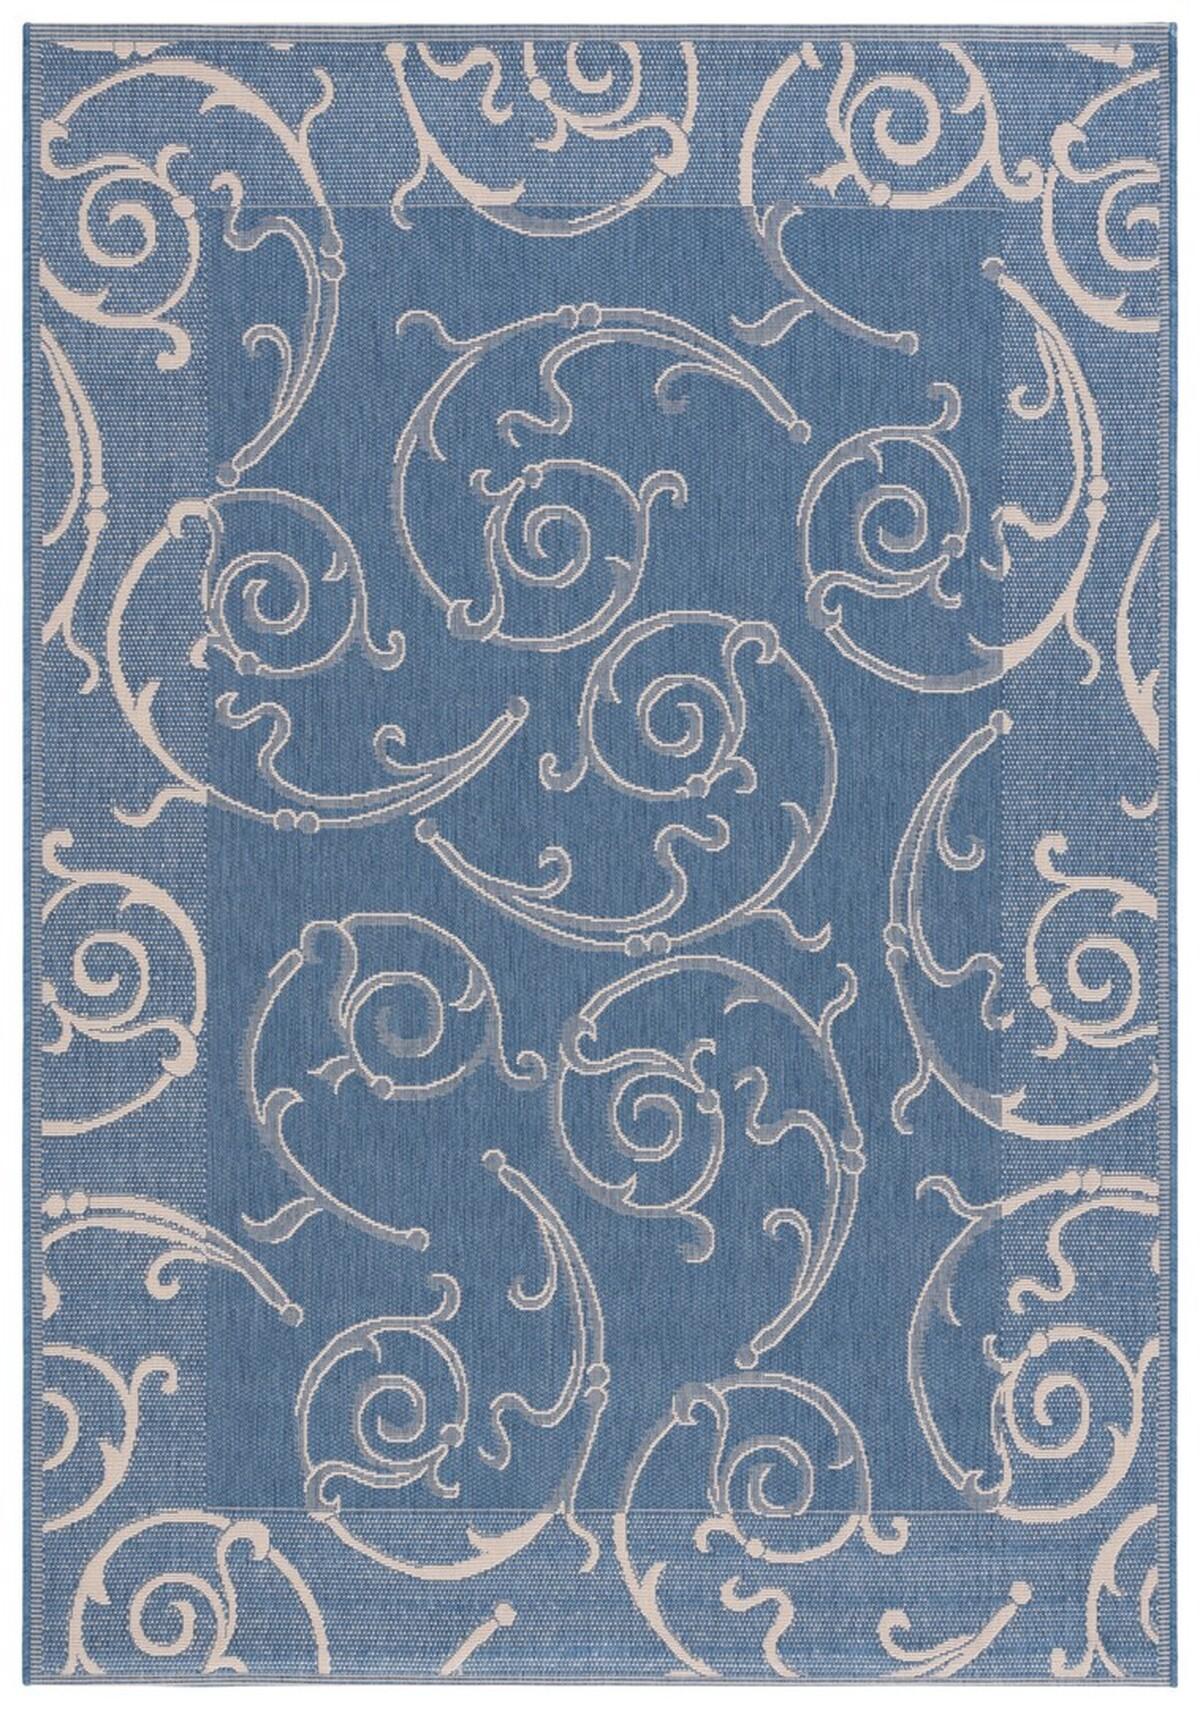 Tone on Tone Blue Vine Scroll Outdoor Rug